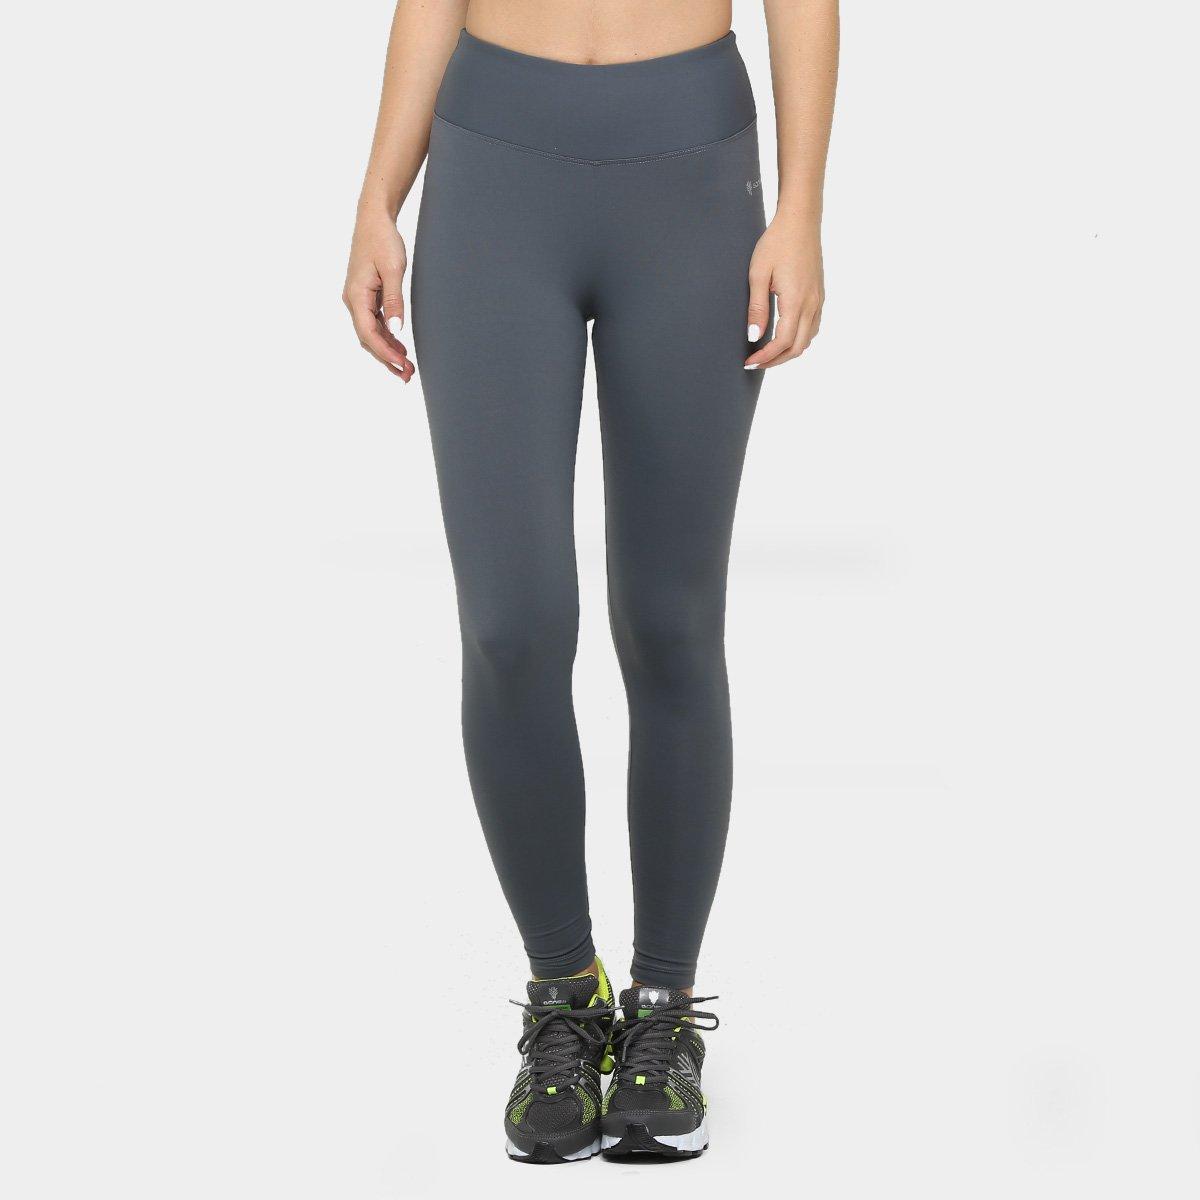 Calça Legging GONEW Lola 3 Feminina 5c5b263a66d7e